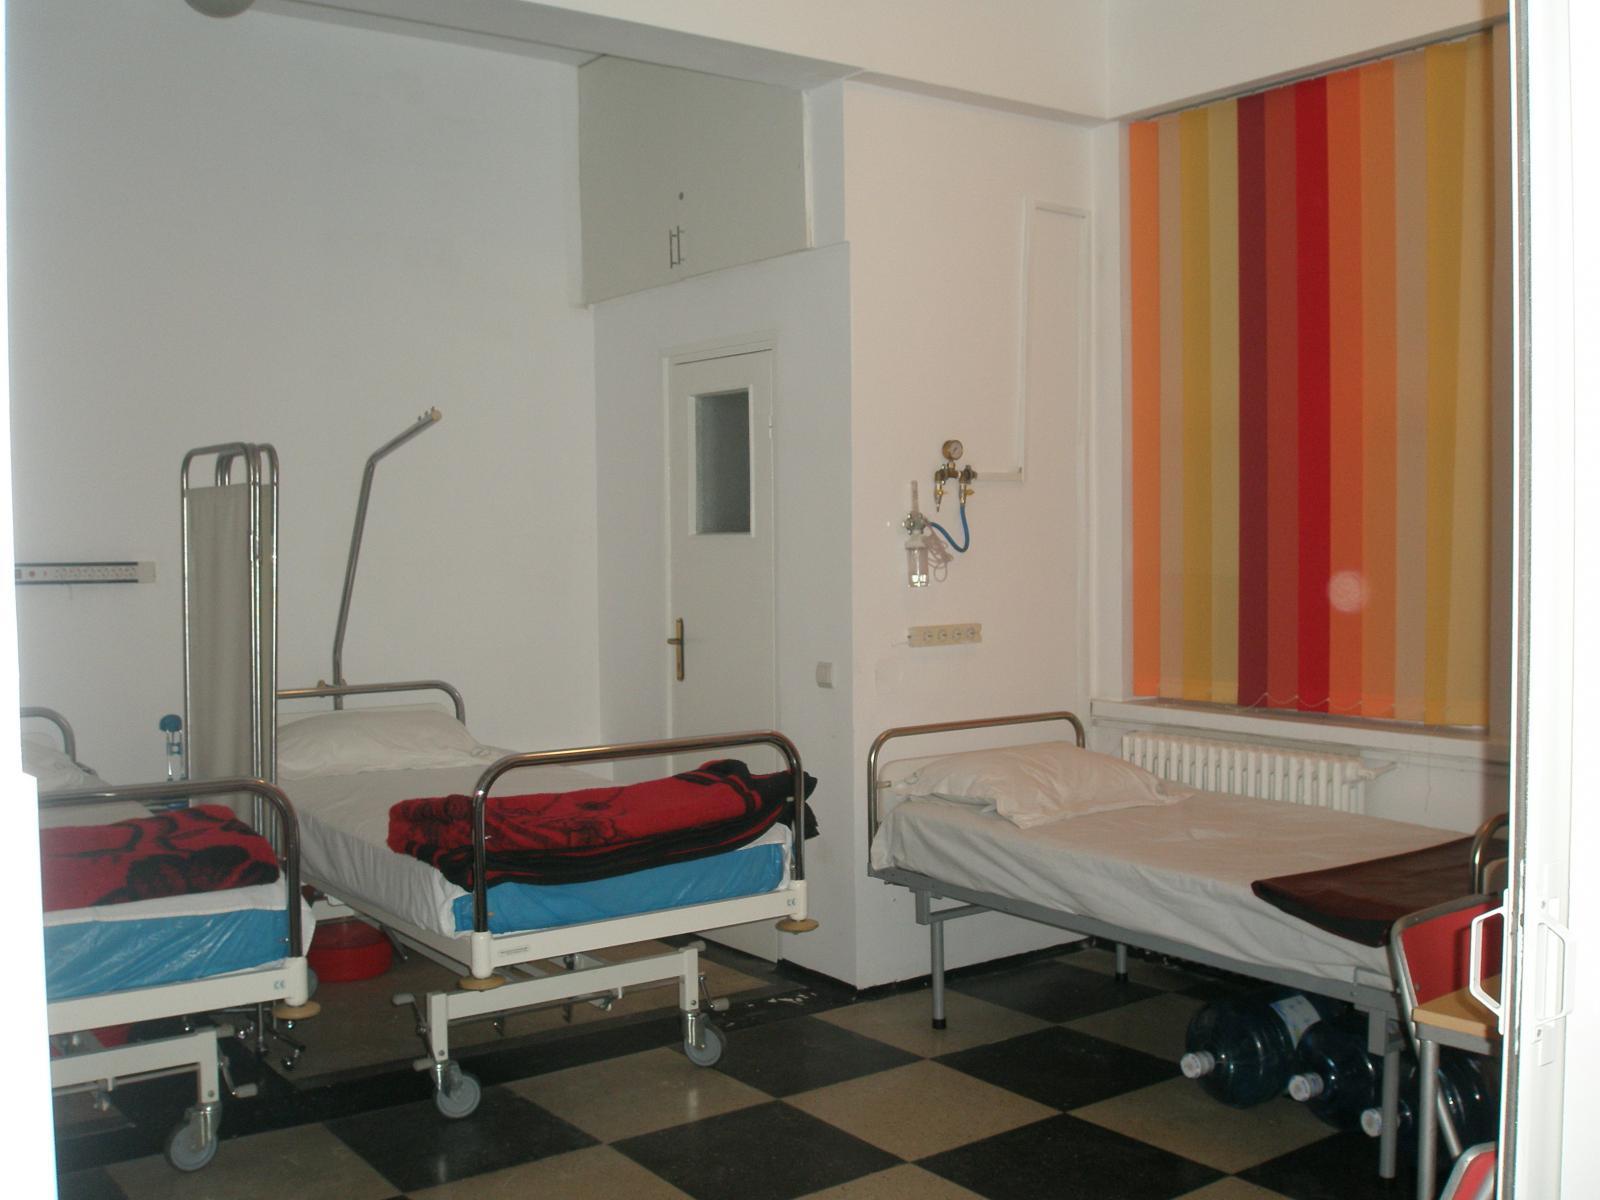 CENTRUL MEDICAL PRAIN SRL - PA180023.JPG